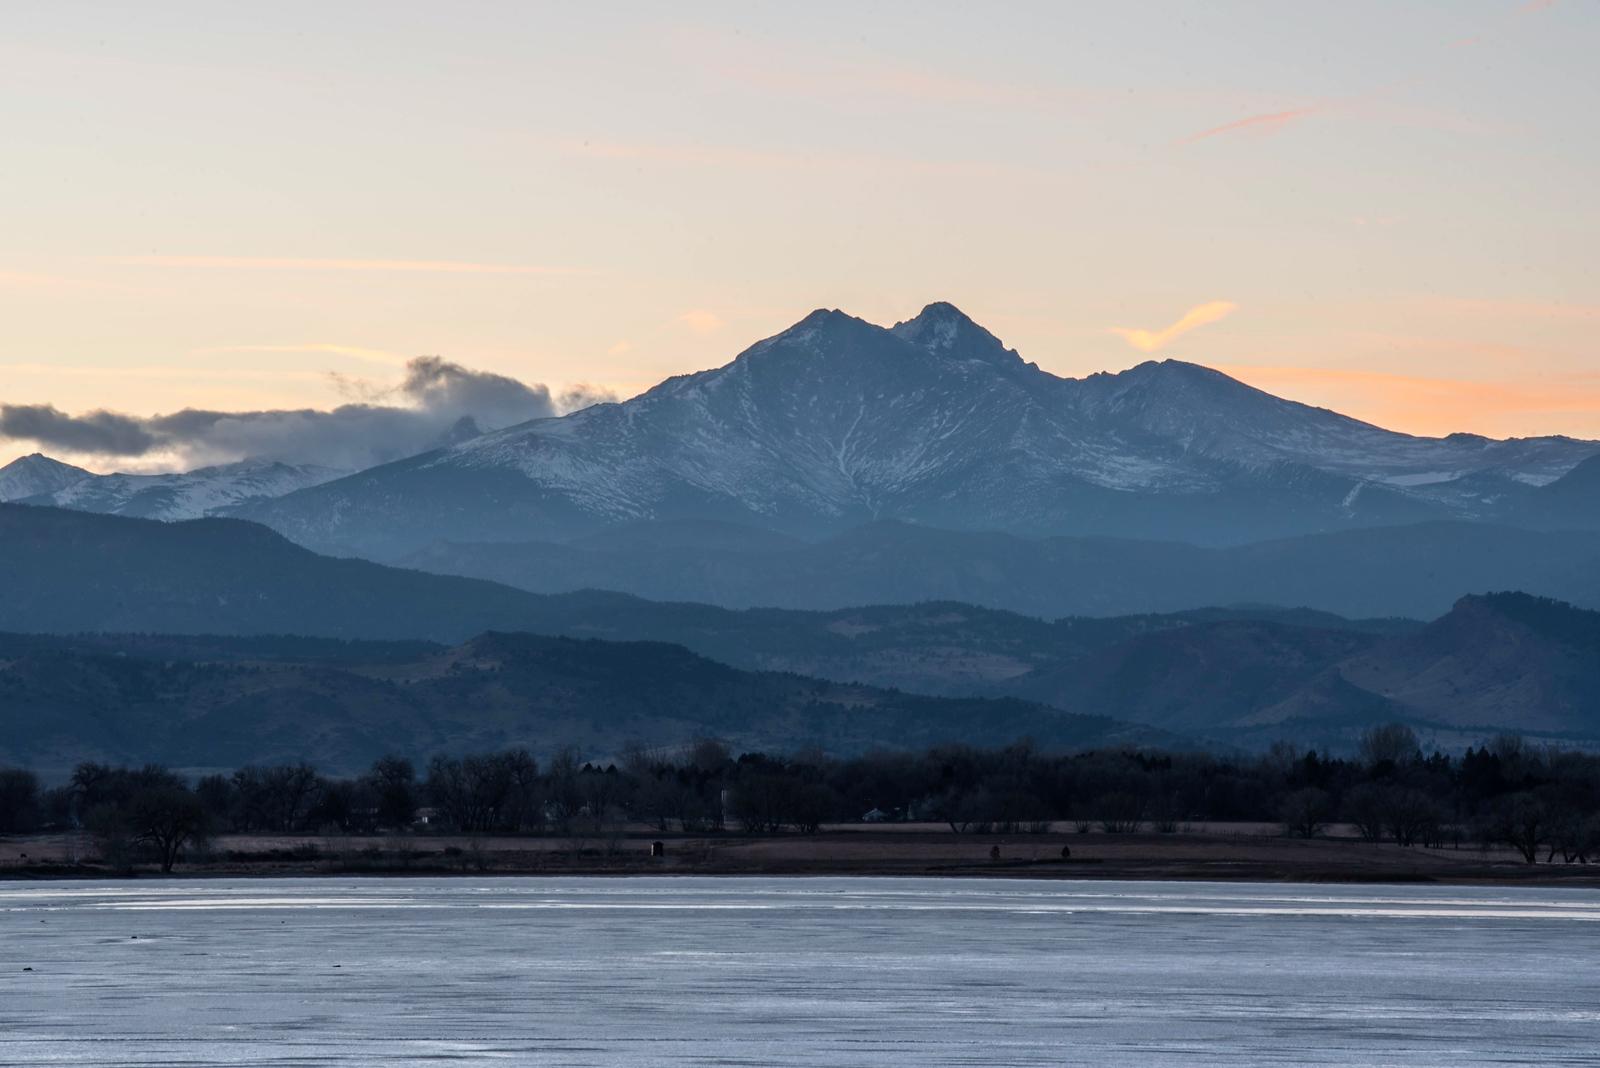 Longs Peak from Longmont, Colorado, at Sunset